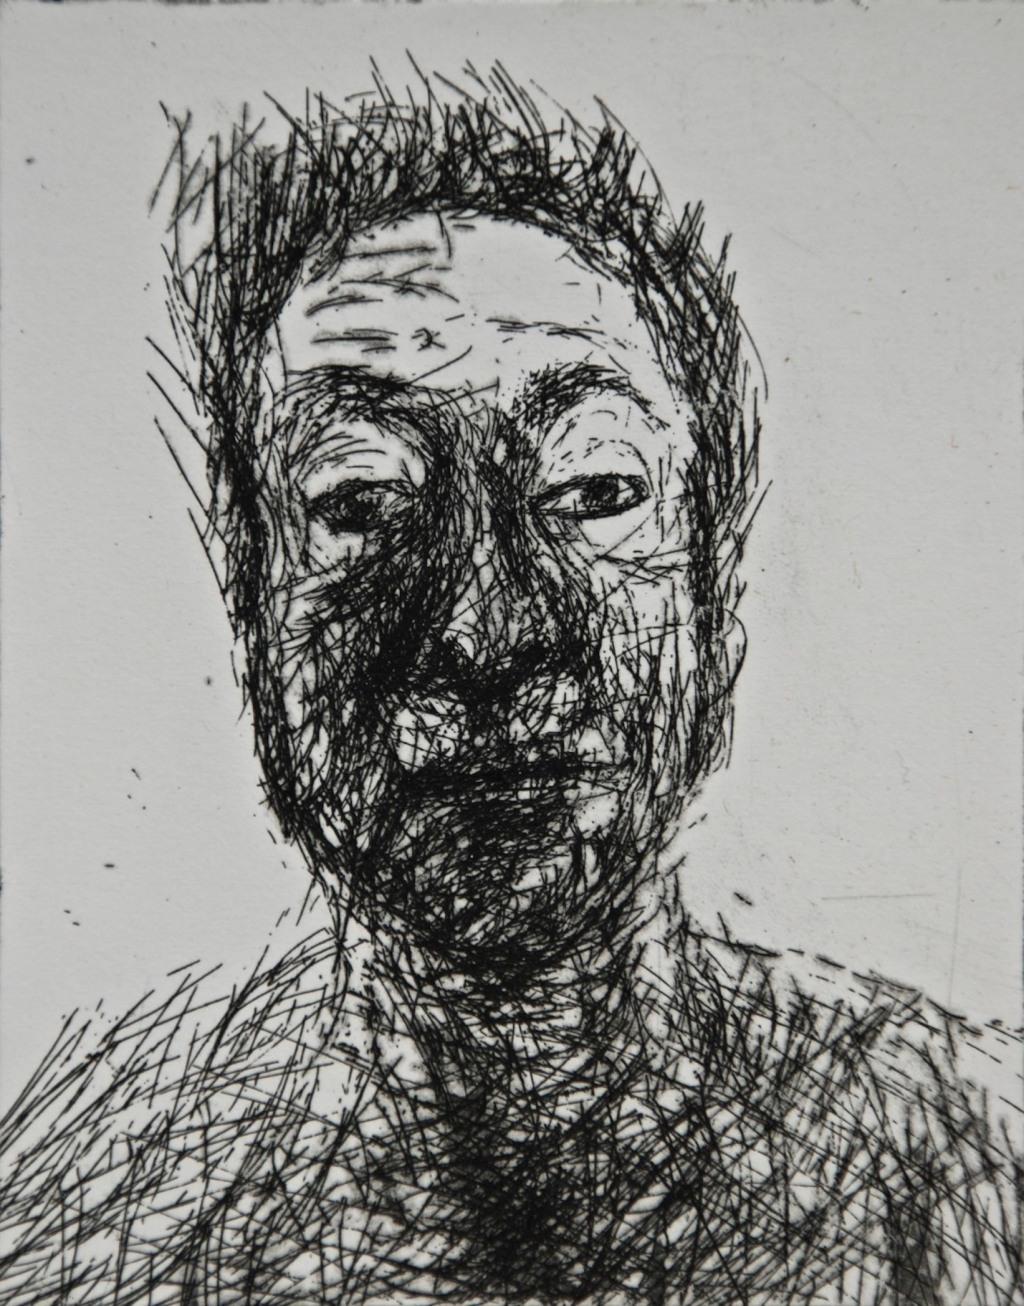 Mood 29, etching, 10 x 8 cm